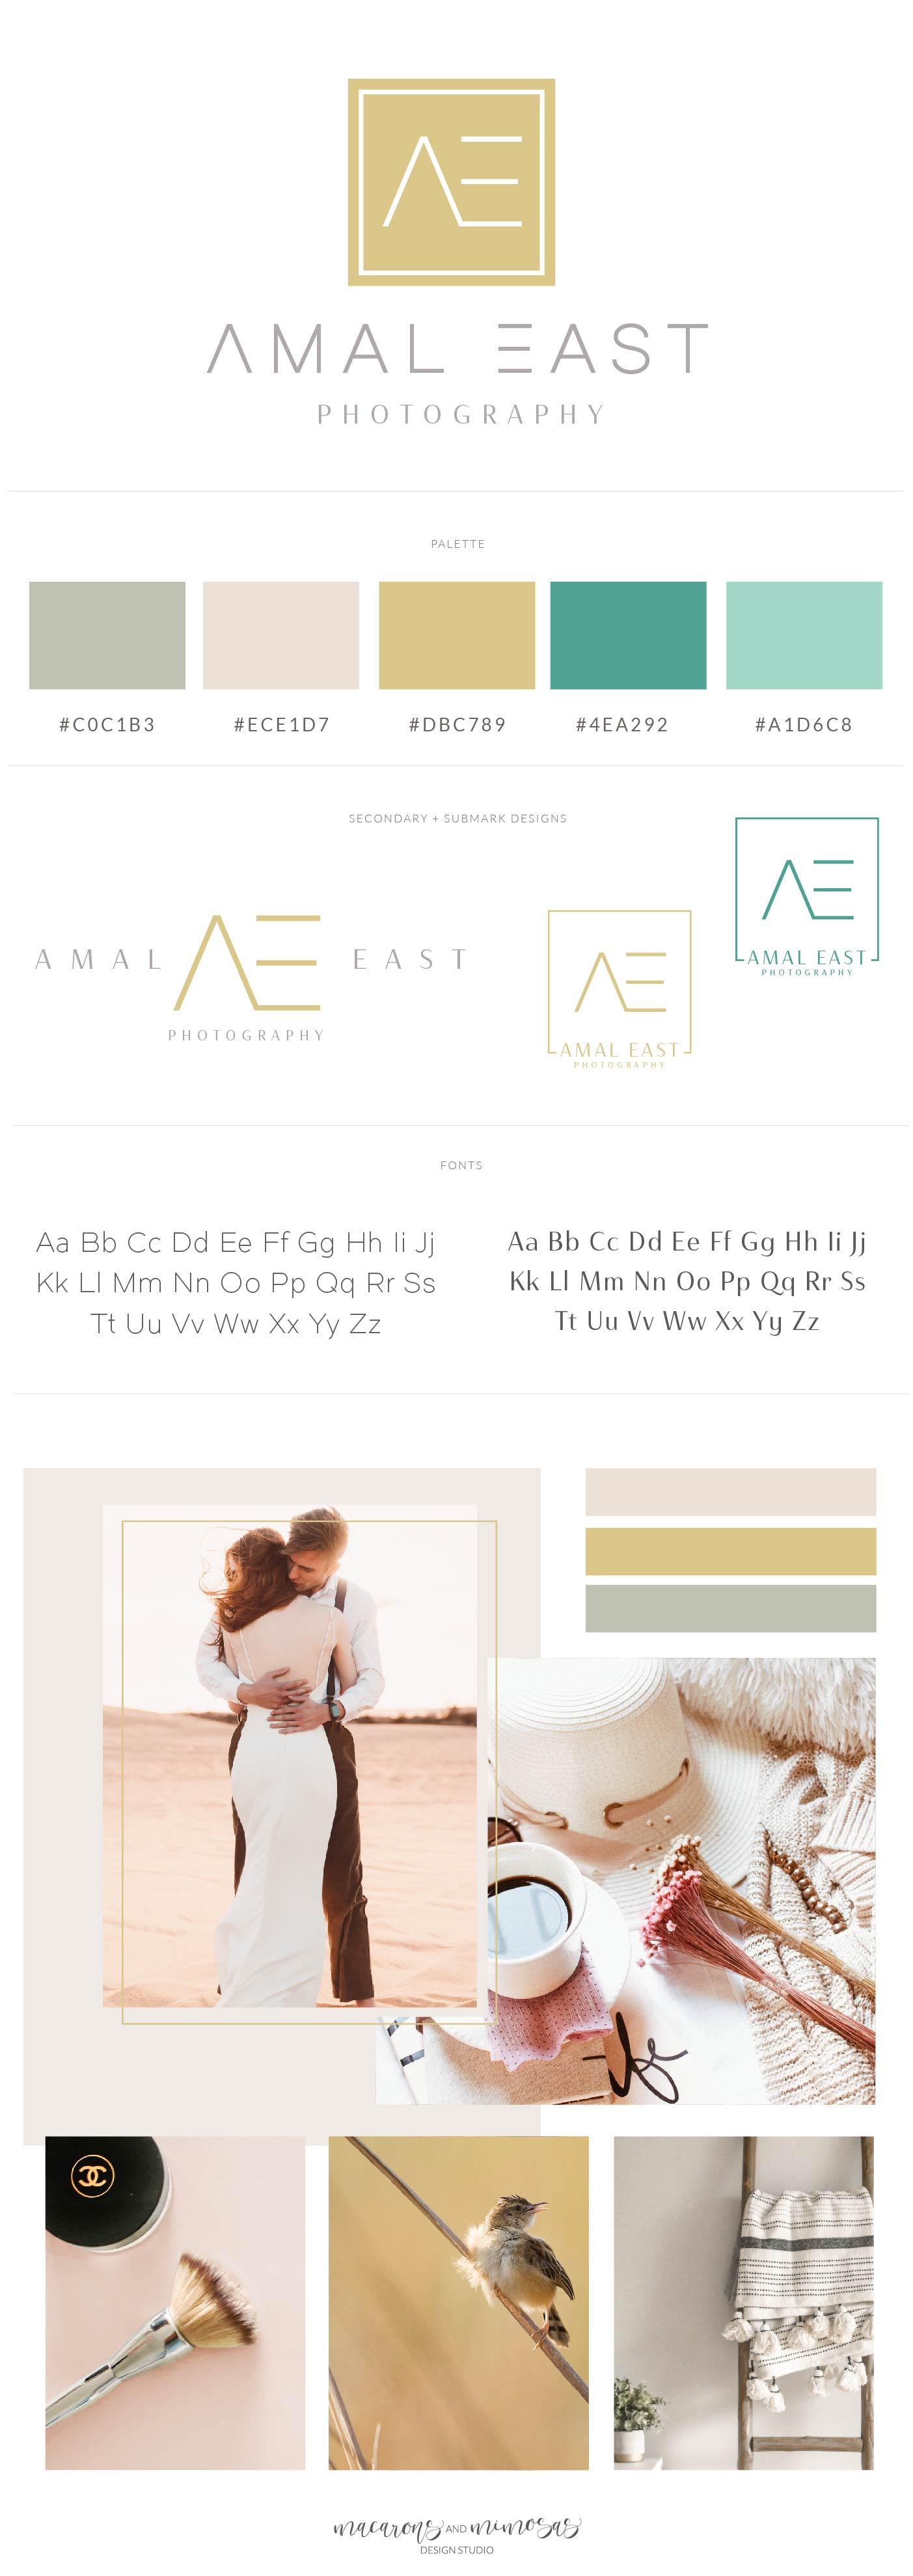 Modern minimal logo for photographer. Photography logo package, Premade Initials logo, Branding Kit, Blog logo design, Watermark, Stamp, Custom business package, Logo package.